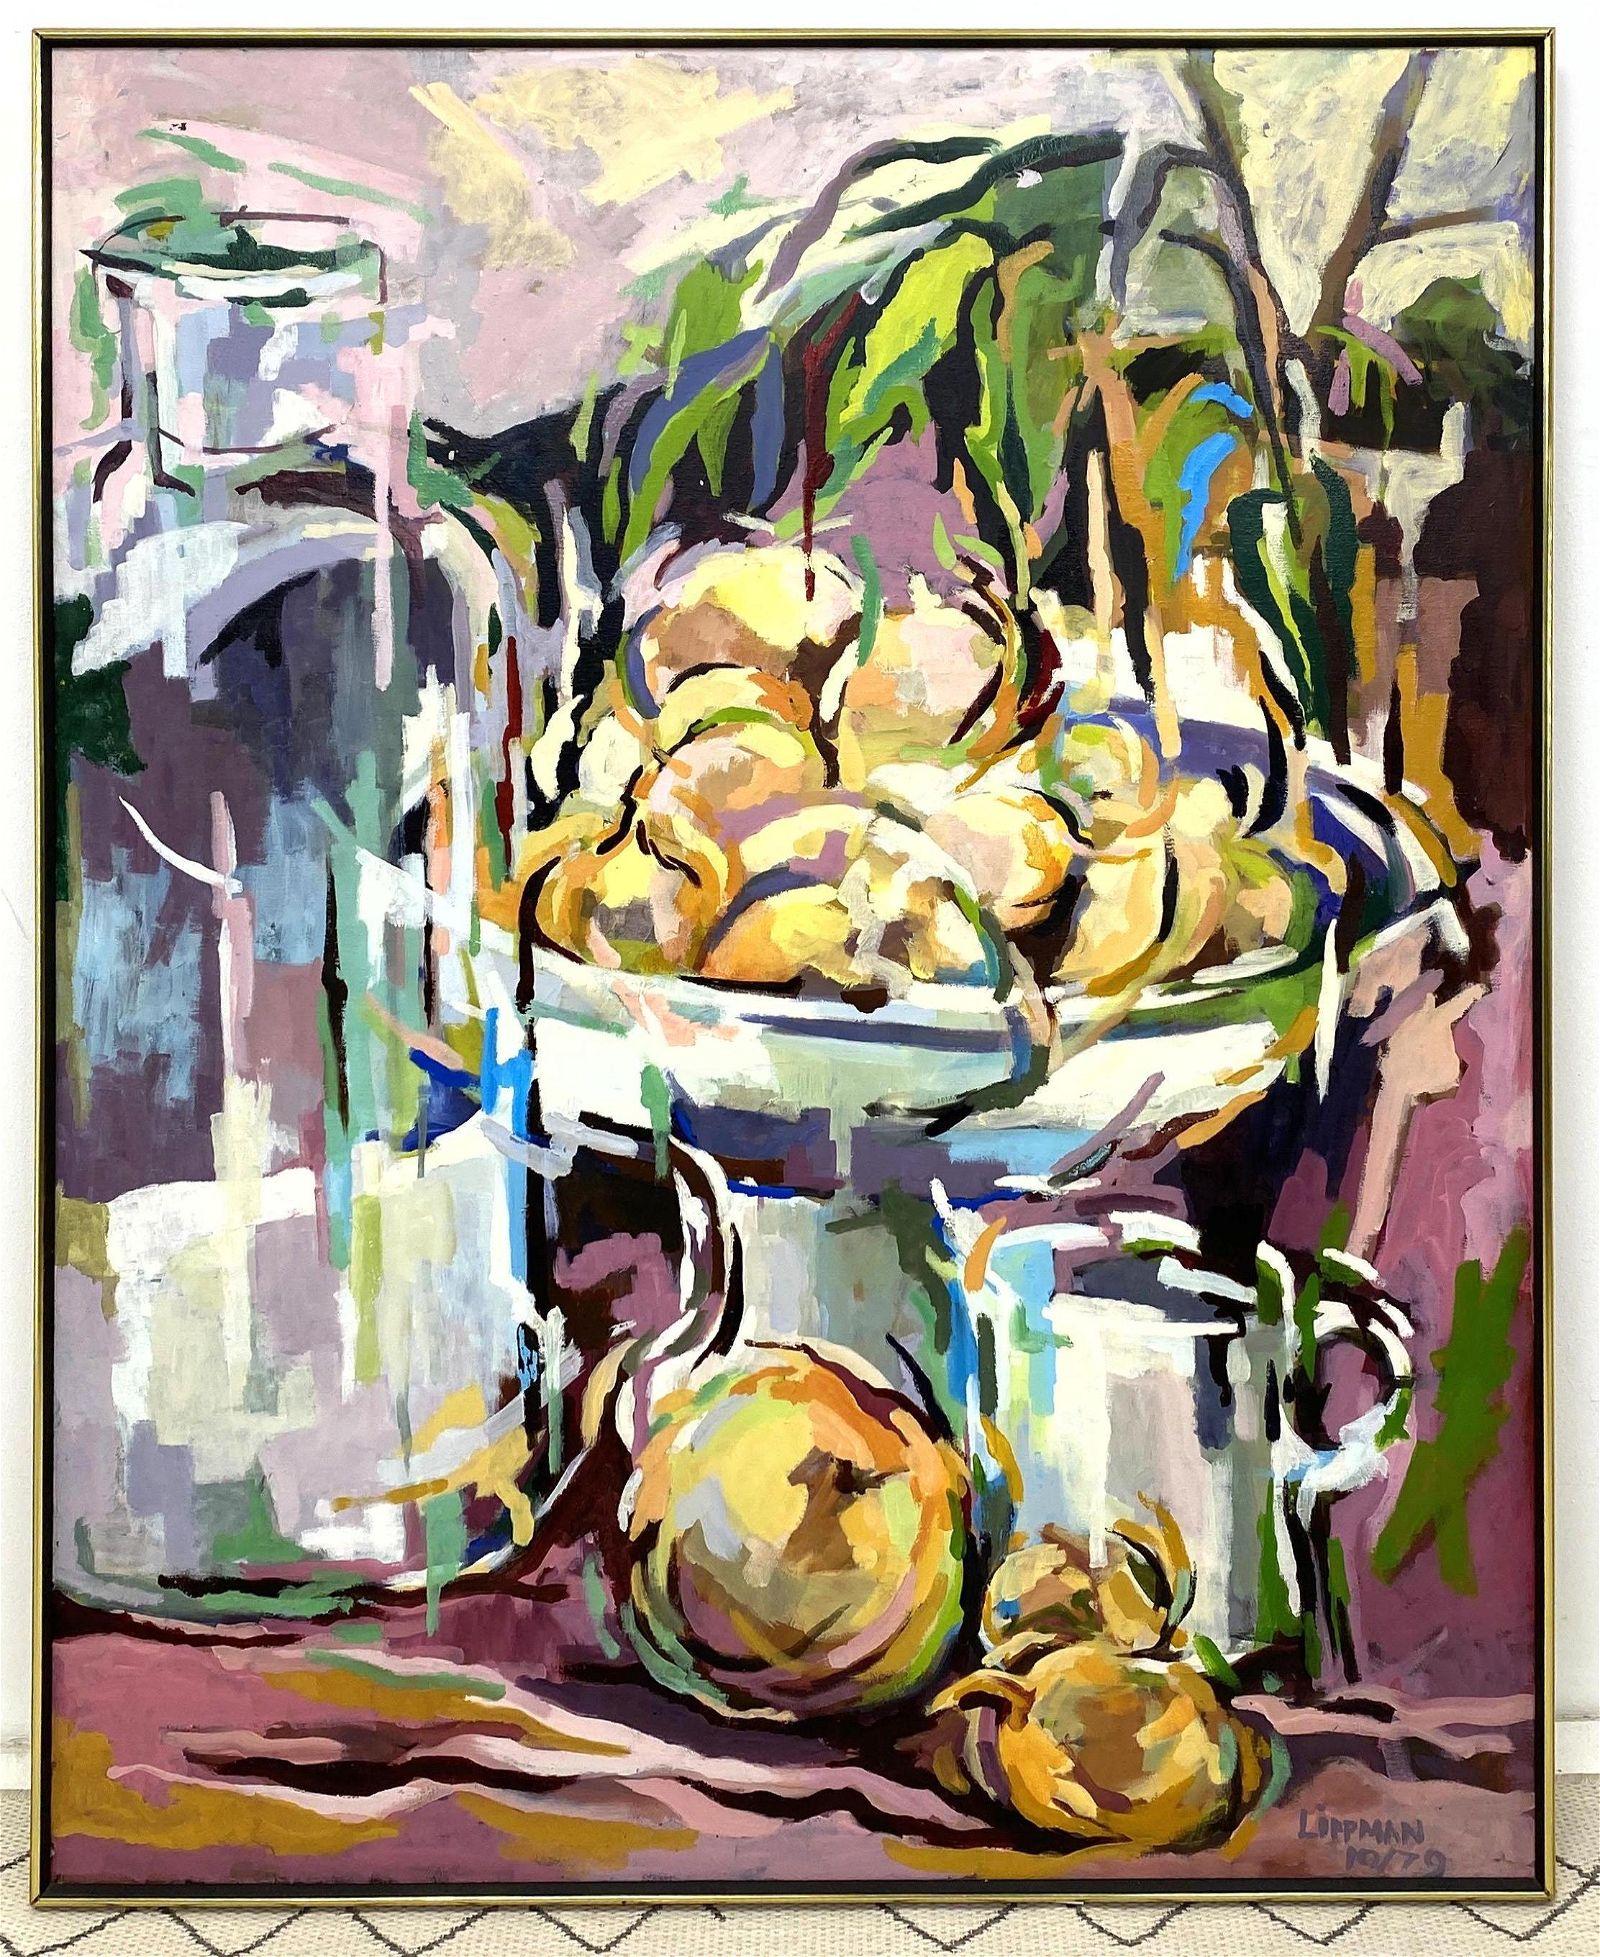 Large LEE LIPPMAN Oil Painting on Canvas.  Modernist St